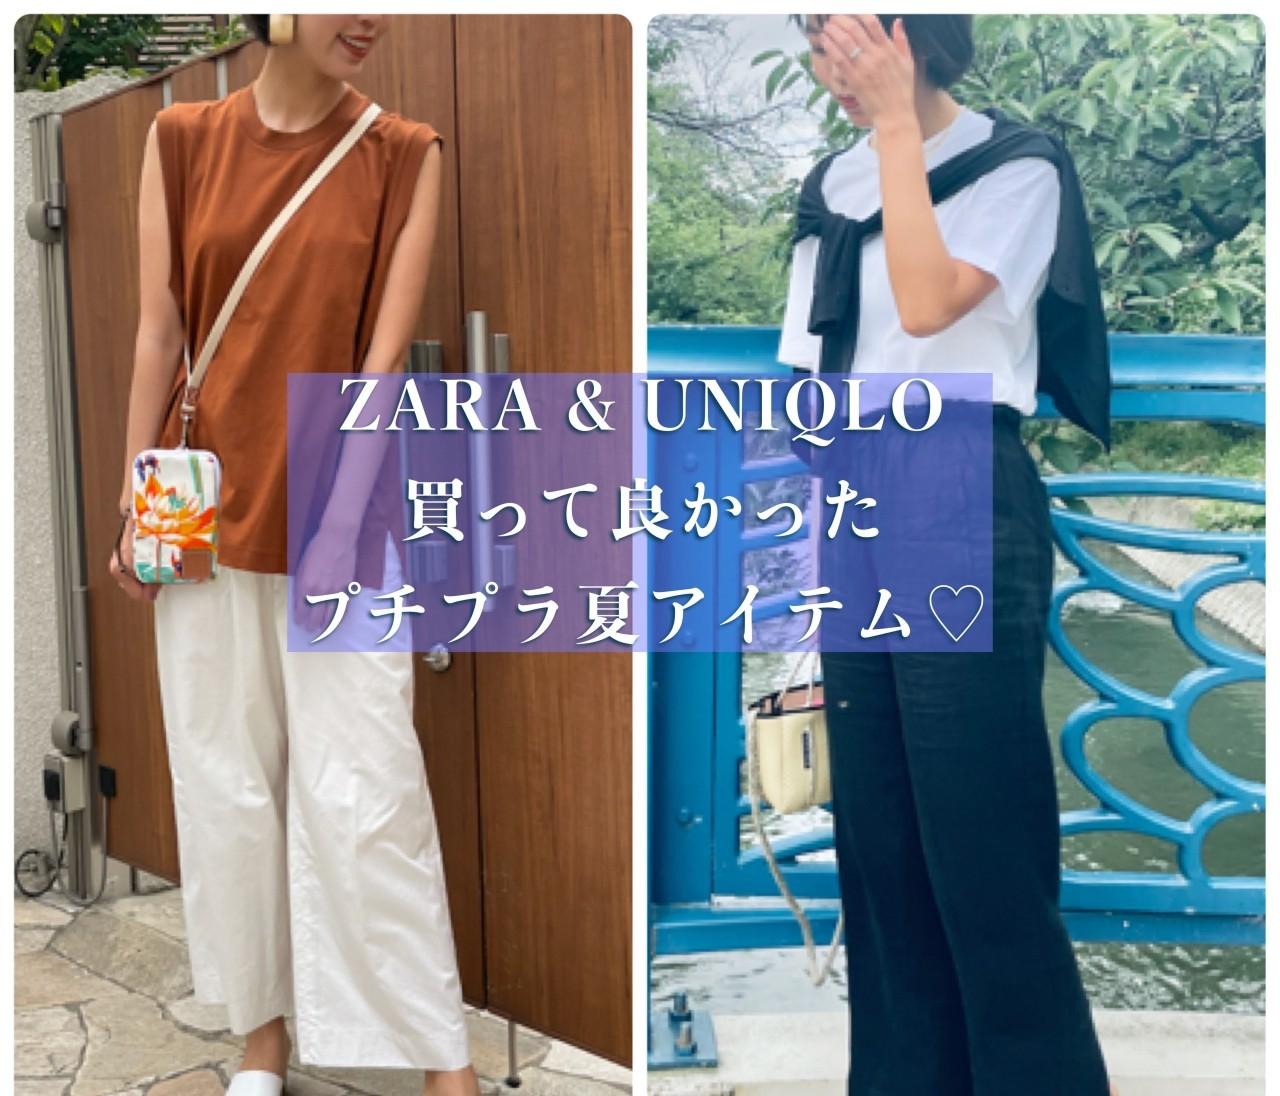 <ZARA&UNIQLO>5000円以下!後悔しない夏服◎